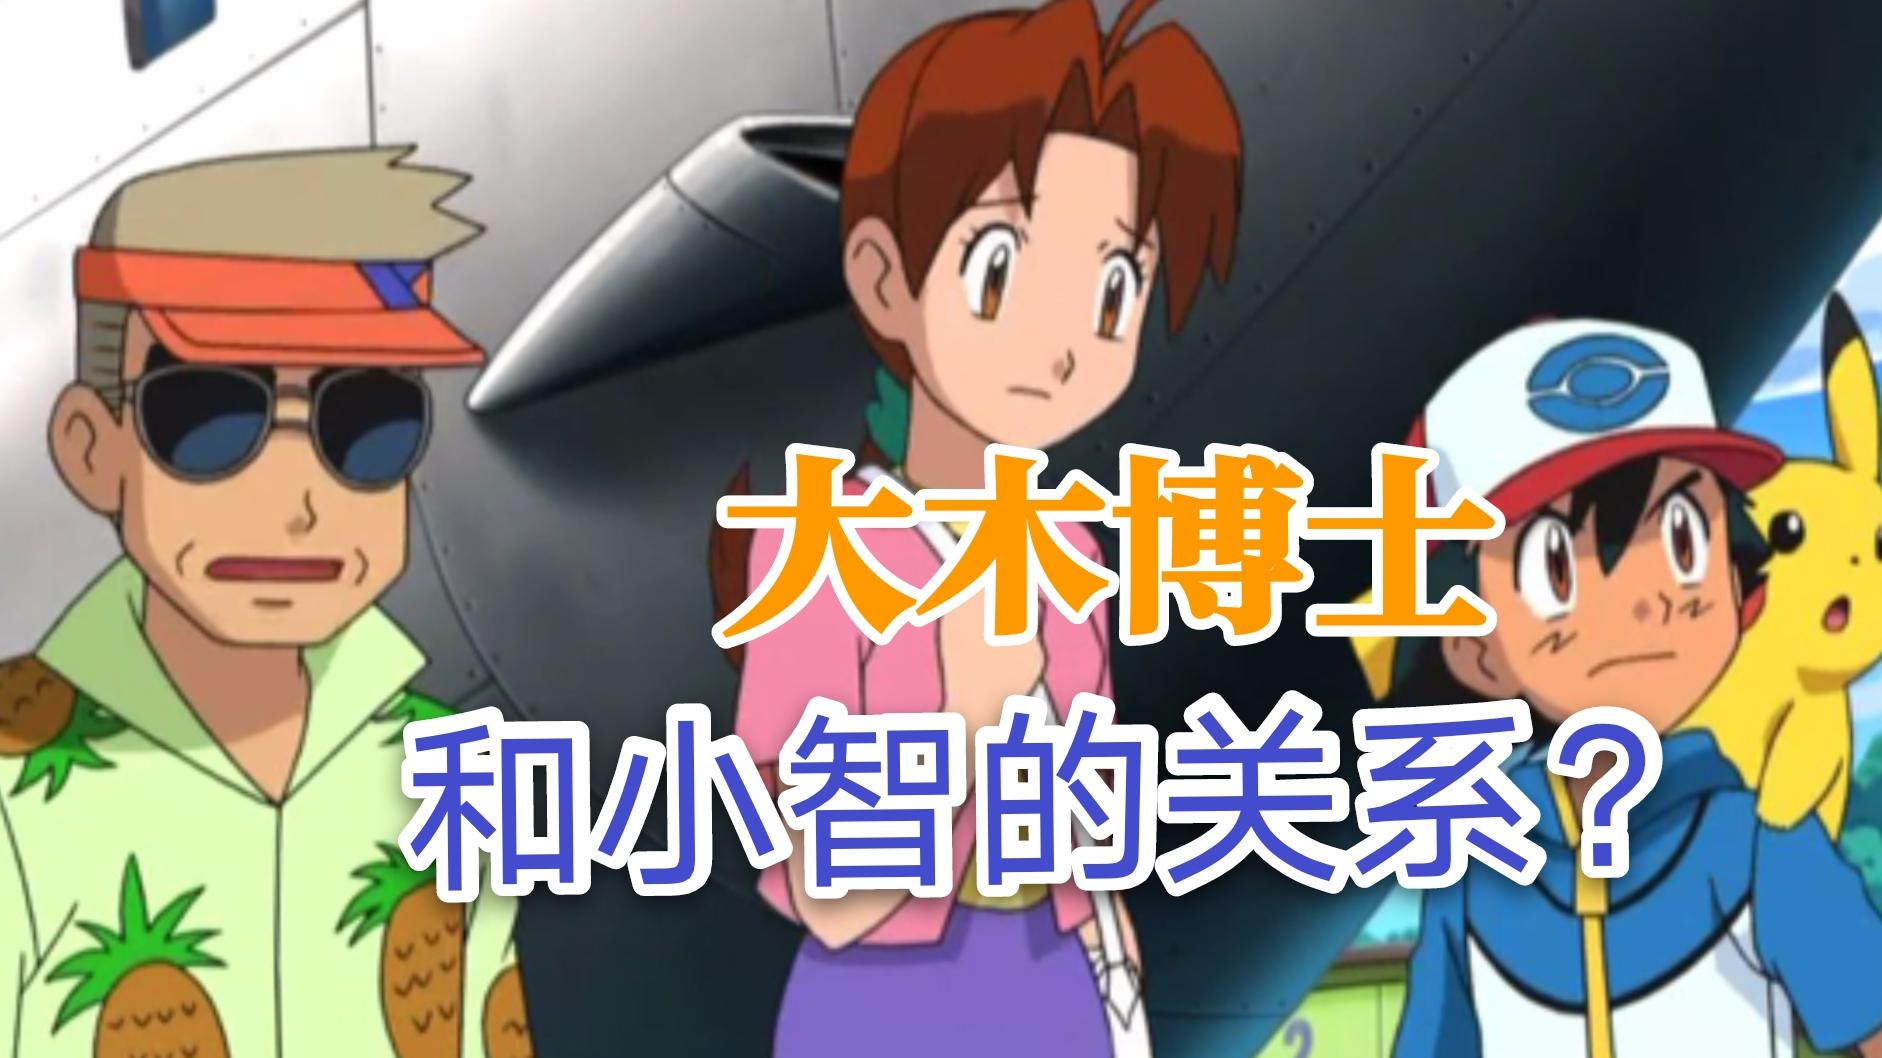 G1N【宝可梦人物志】曾经的冠军现在的博士,强大的大木博士!